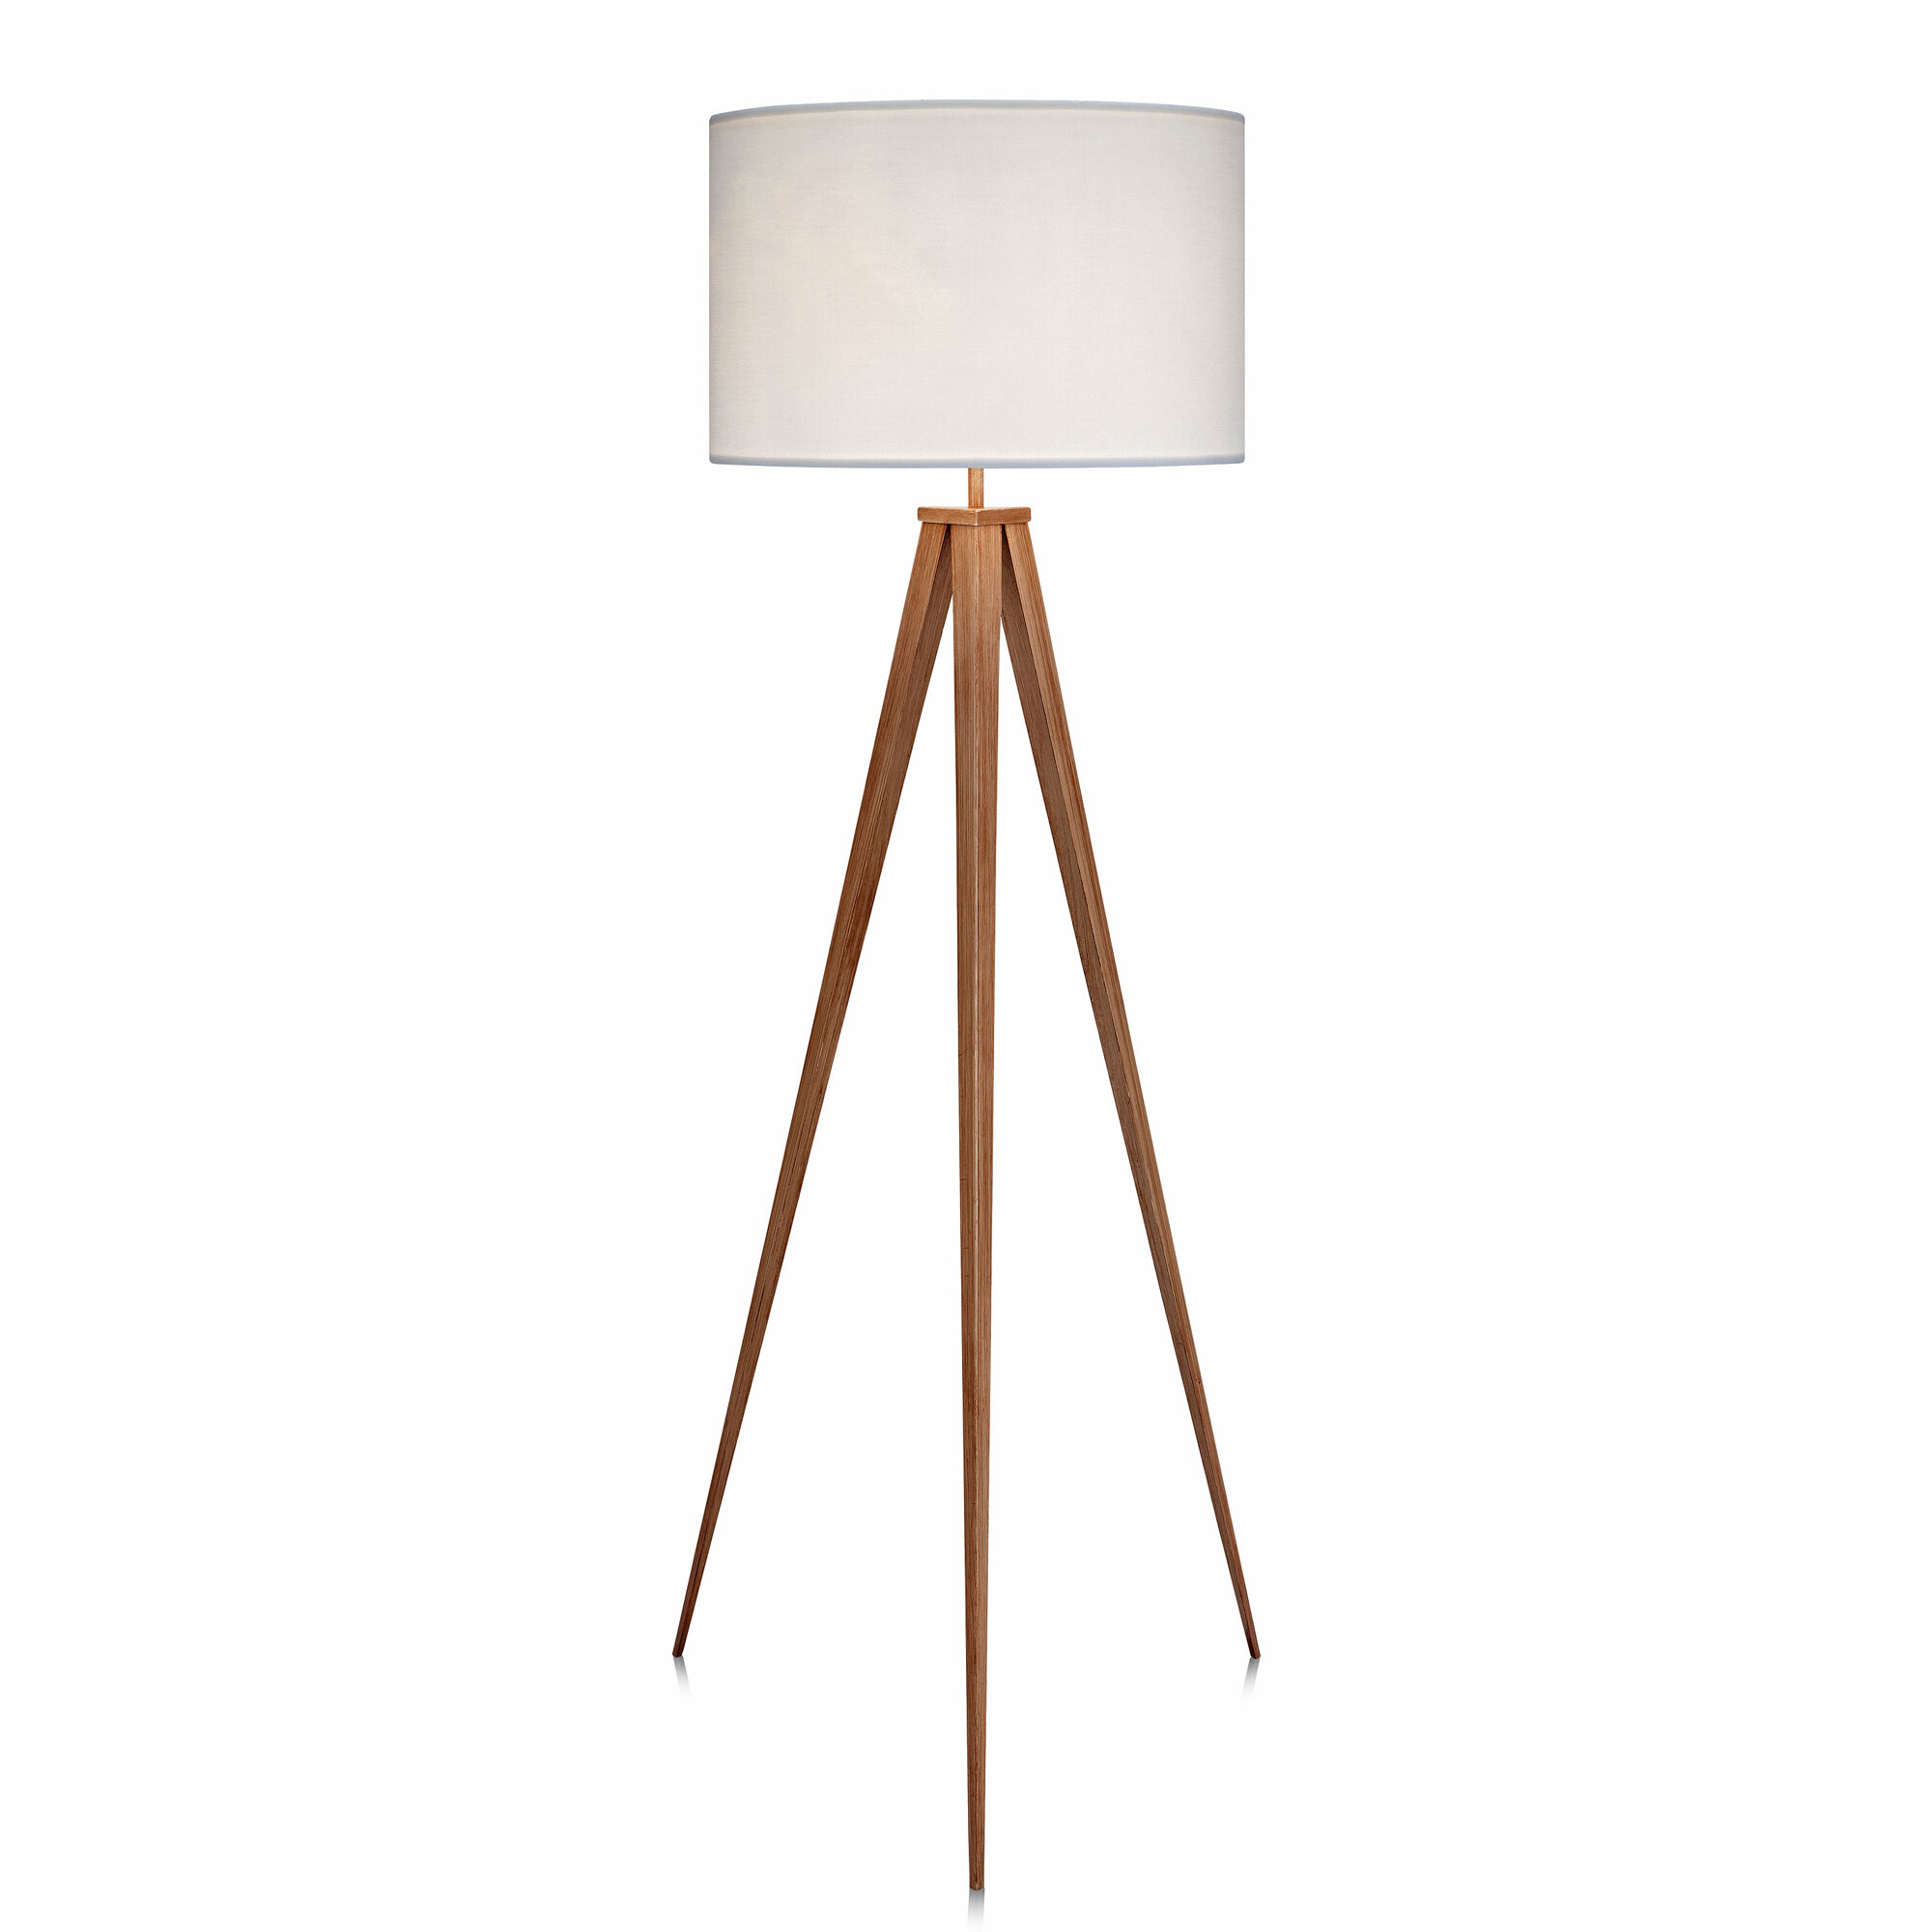 Tripod Floor Lampmodern Living Room Standing Tripod Lamps Tall